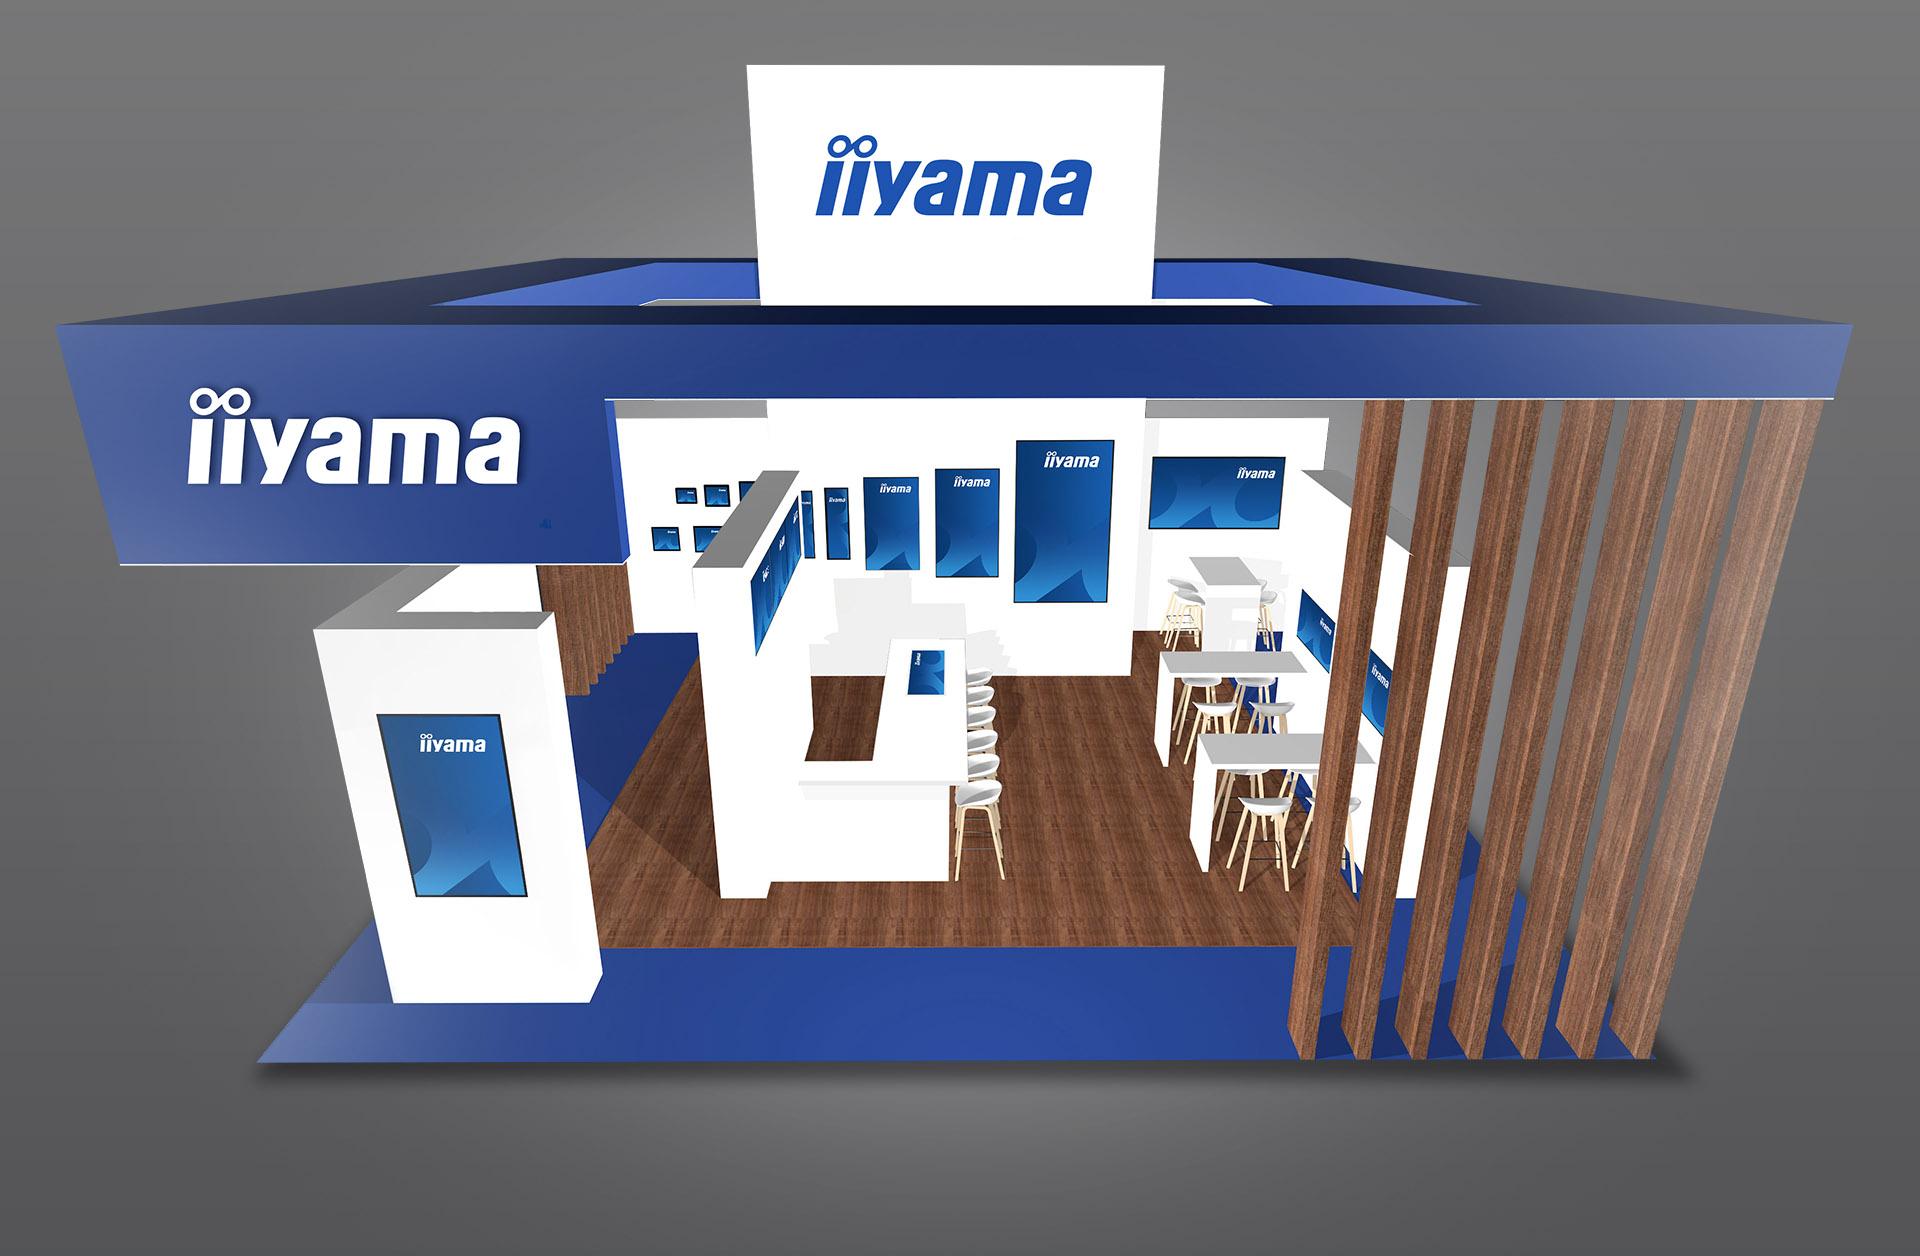 iiyama stand 8-G120 ISE